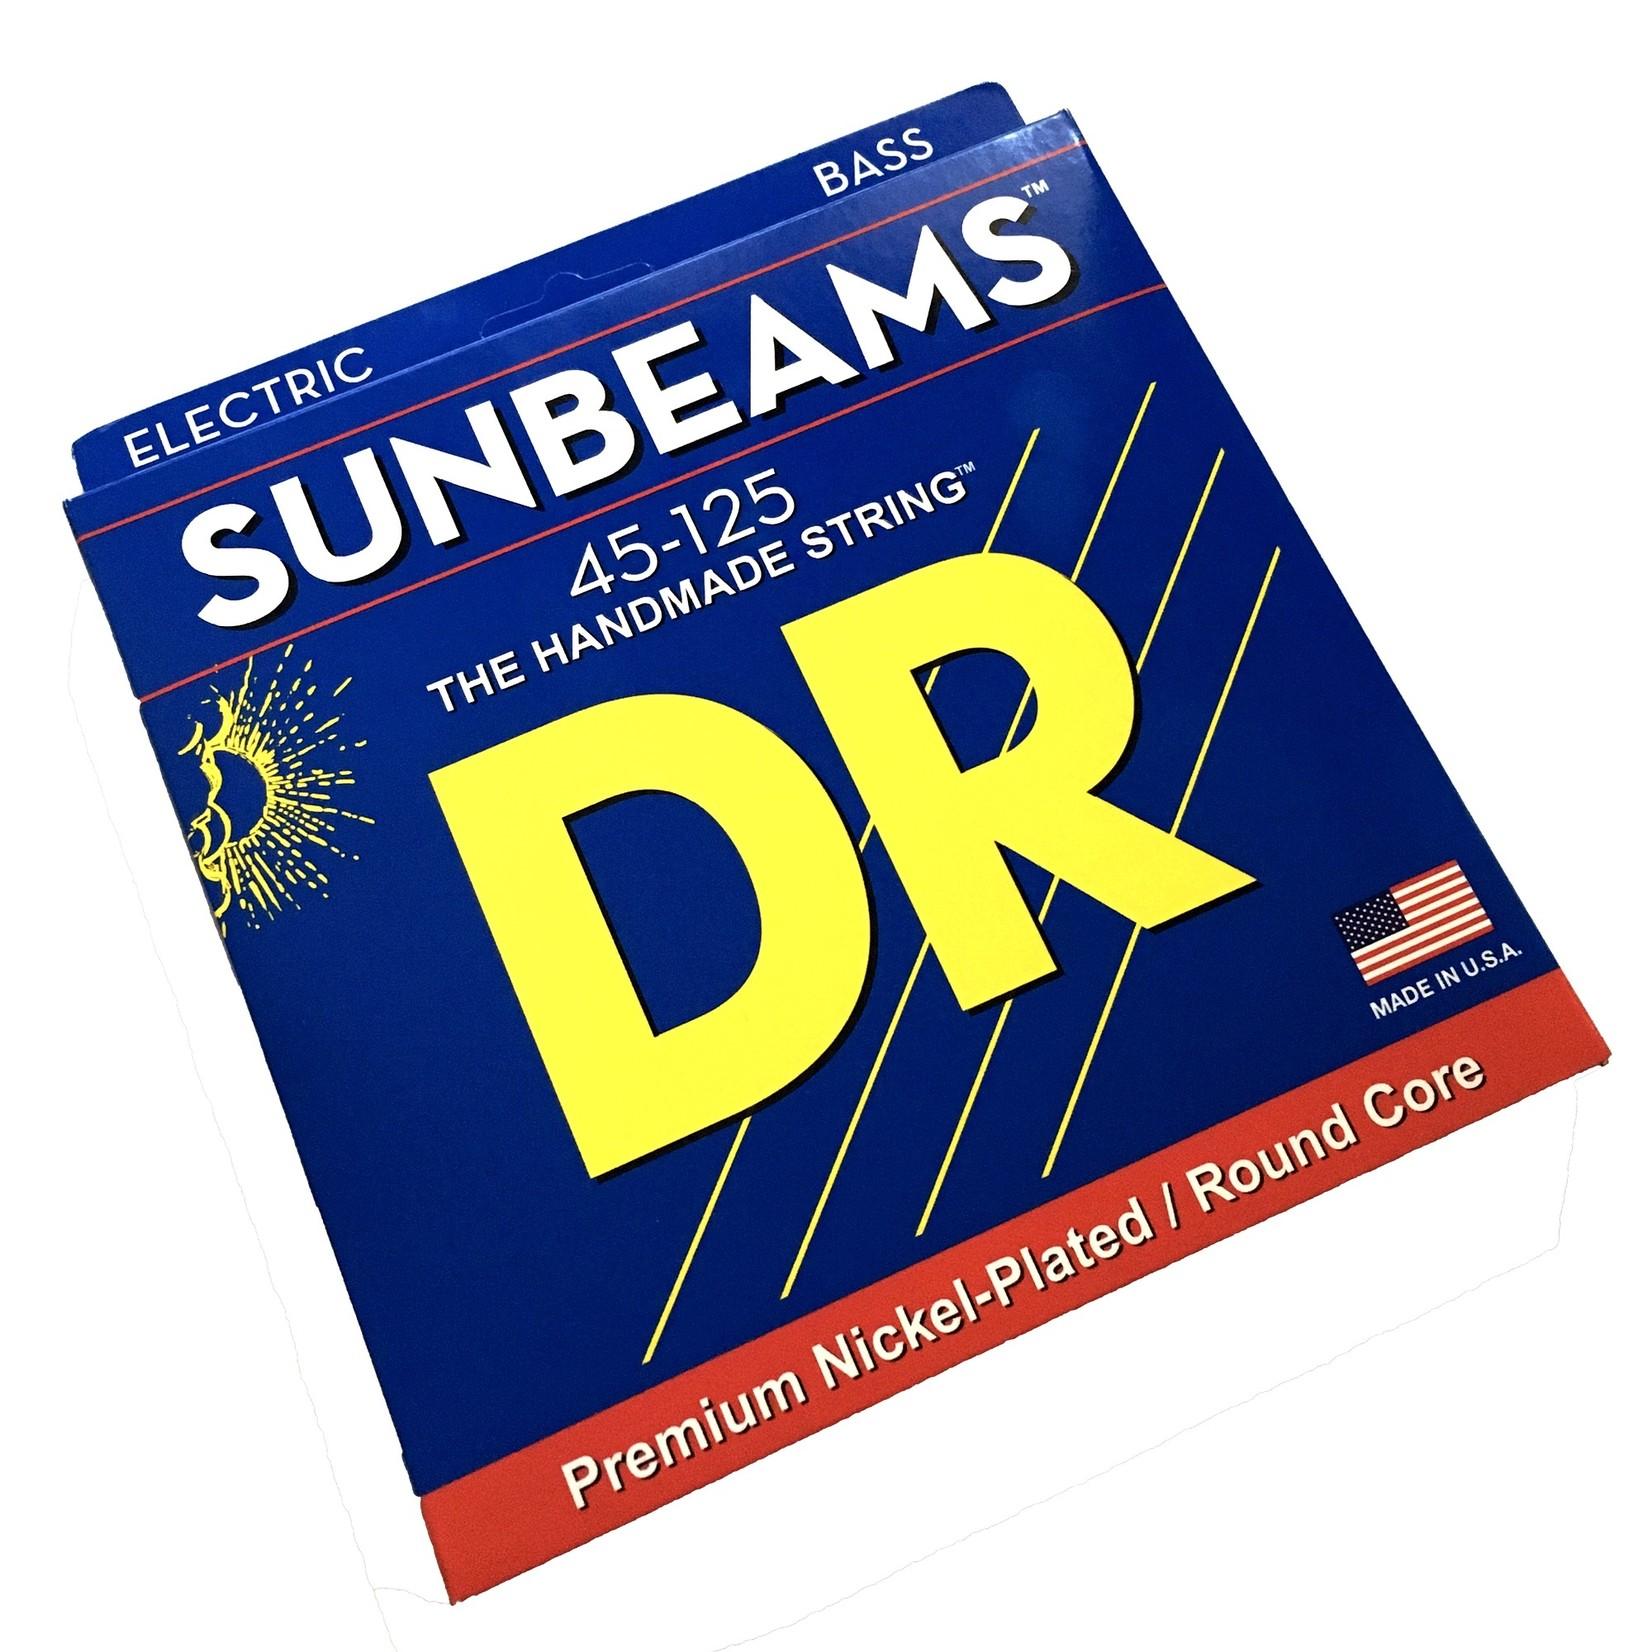 DR Strings DR NMR5-45 Sunbeams, 5-String (45-125) Bass Strings, Premium Nickel-Plated / Round Core